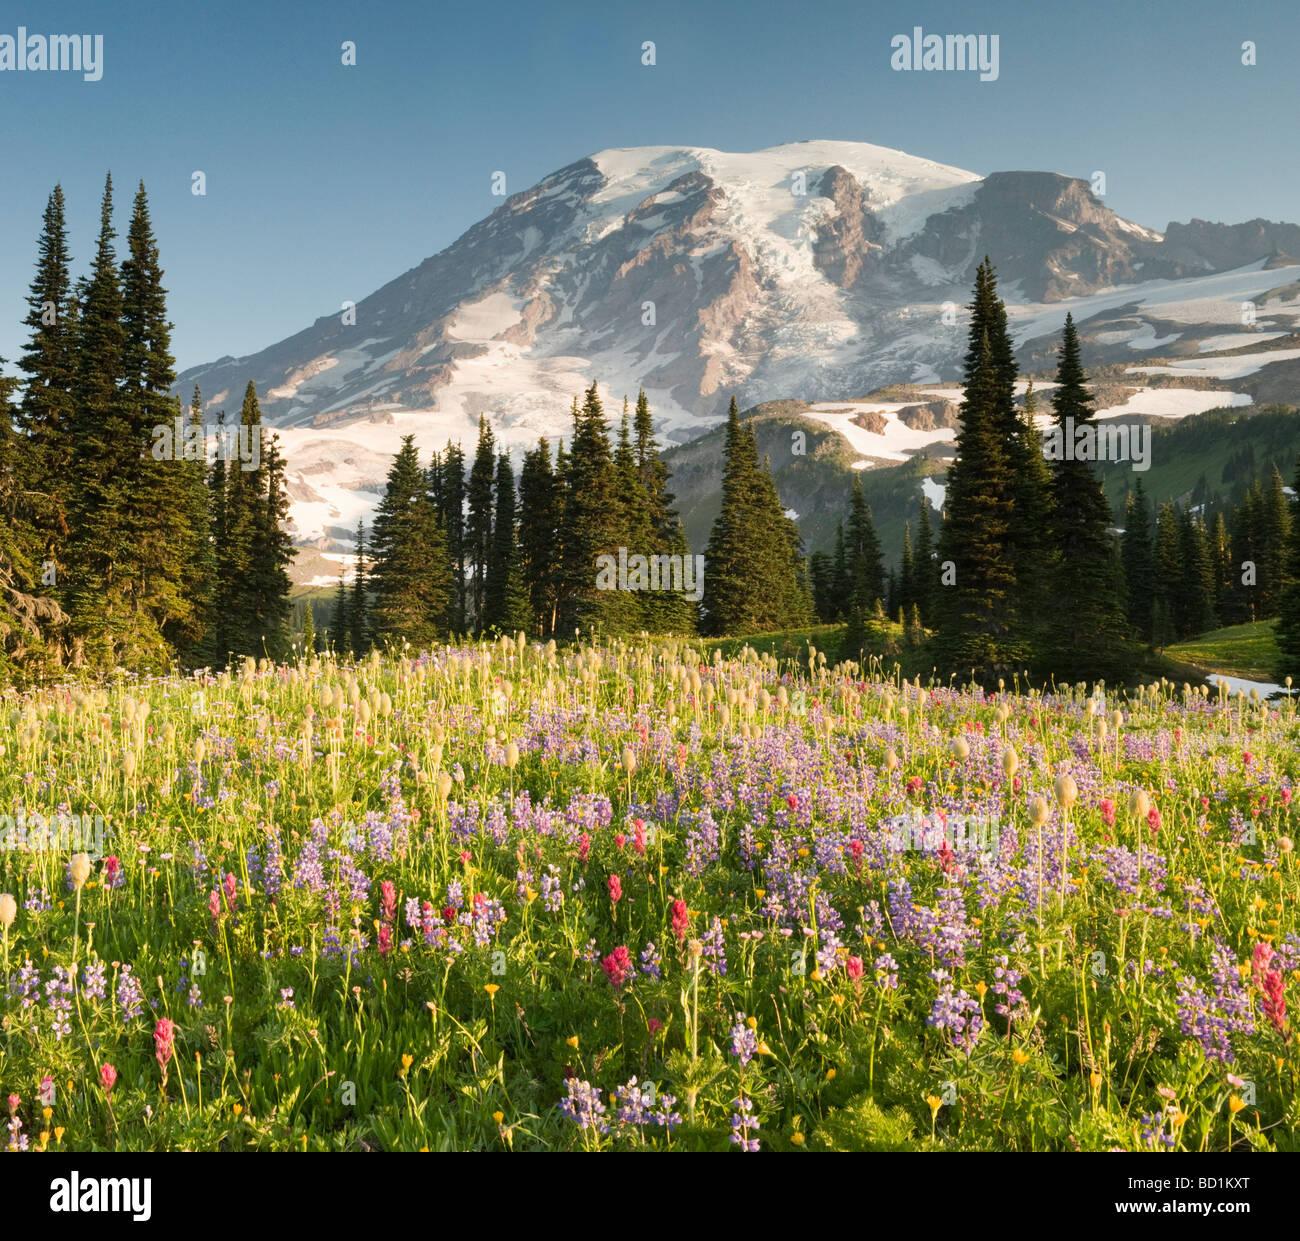 Summer Wildflowers, Paradise Meadows, Mount Rainier National Park, Washington JULY - Stock Image